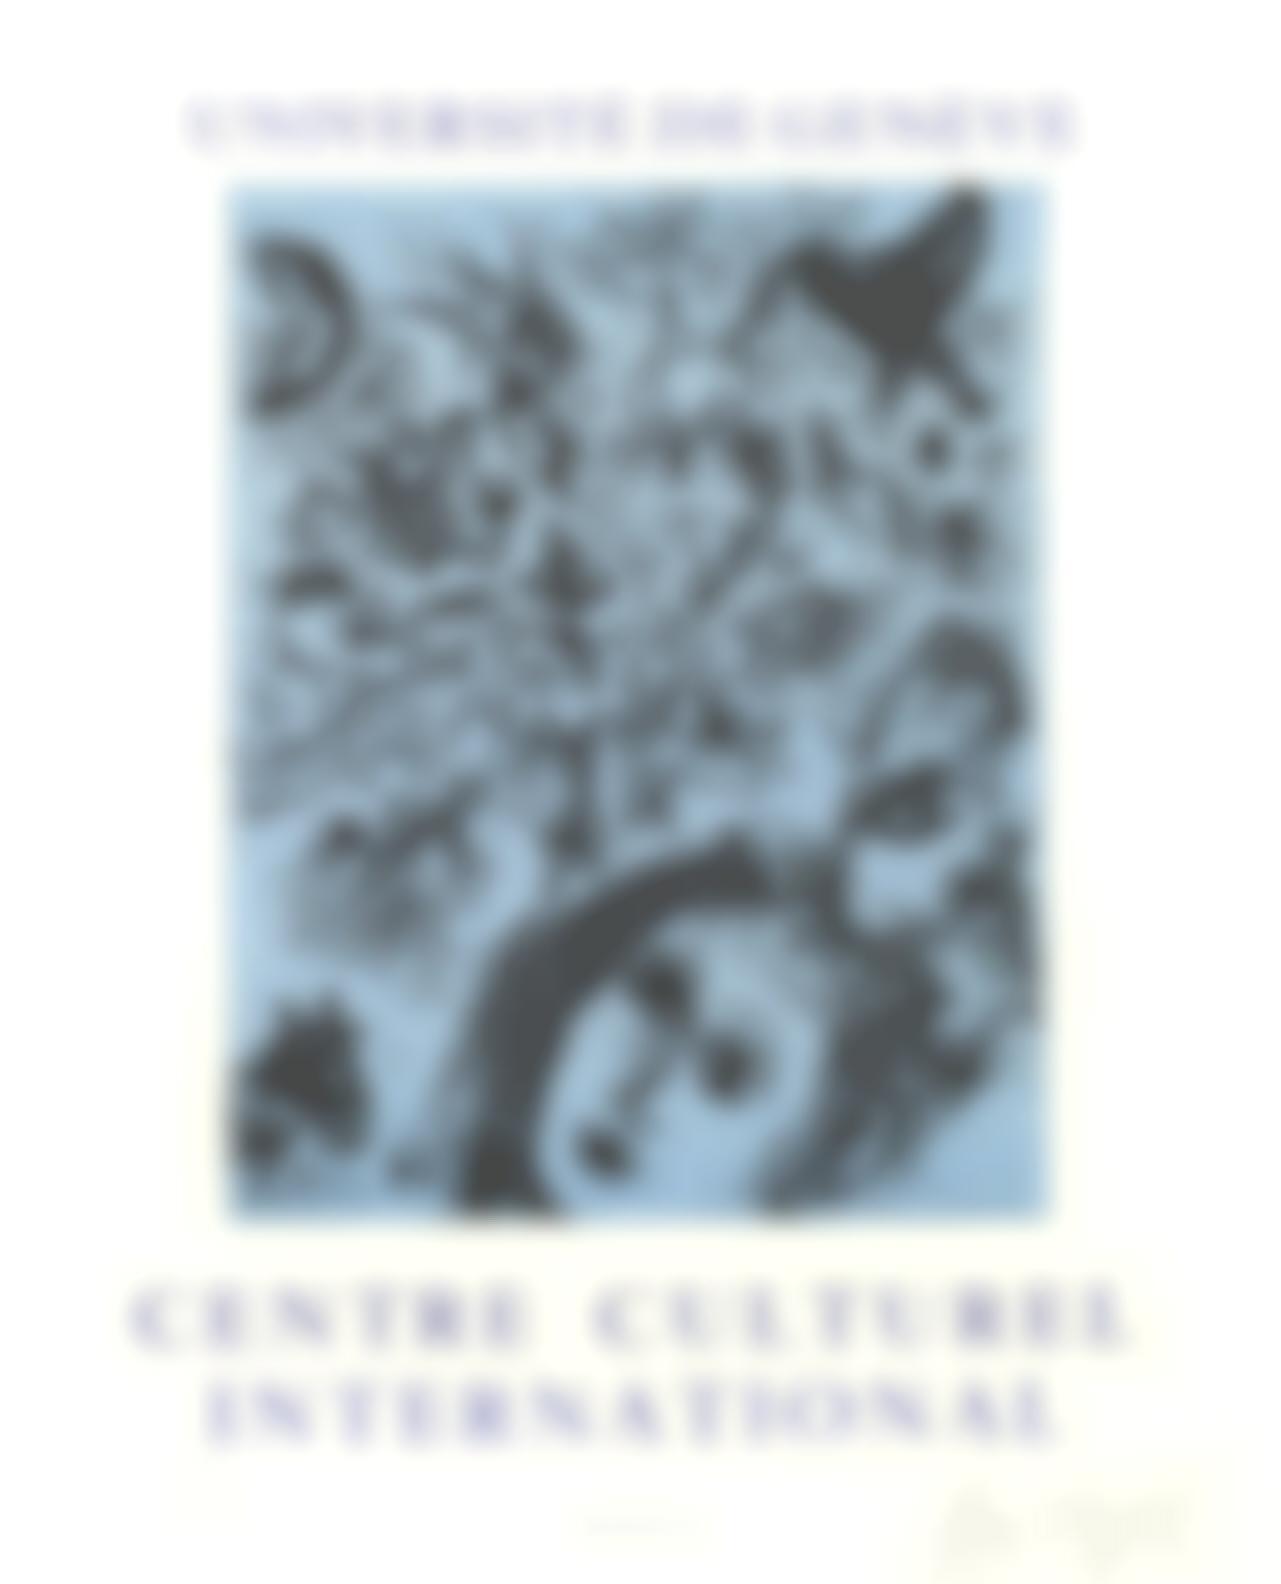 Marc Chagall-Universite De Geneve, Centre Culturel International-1971